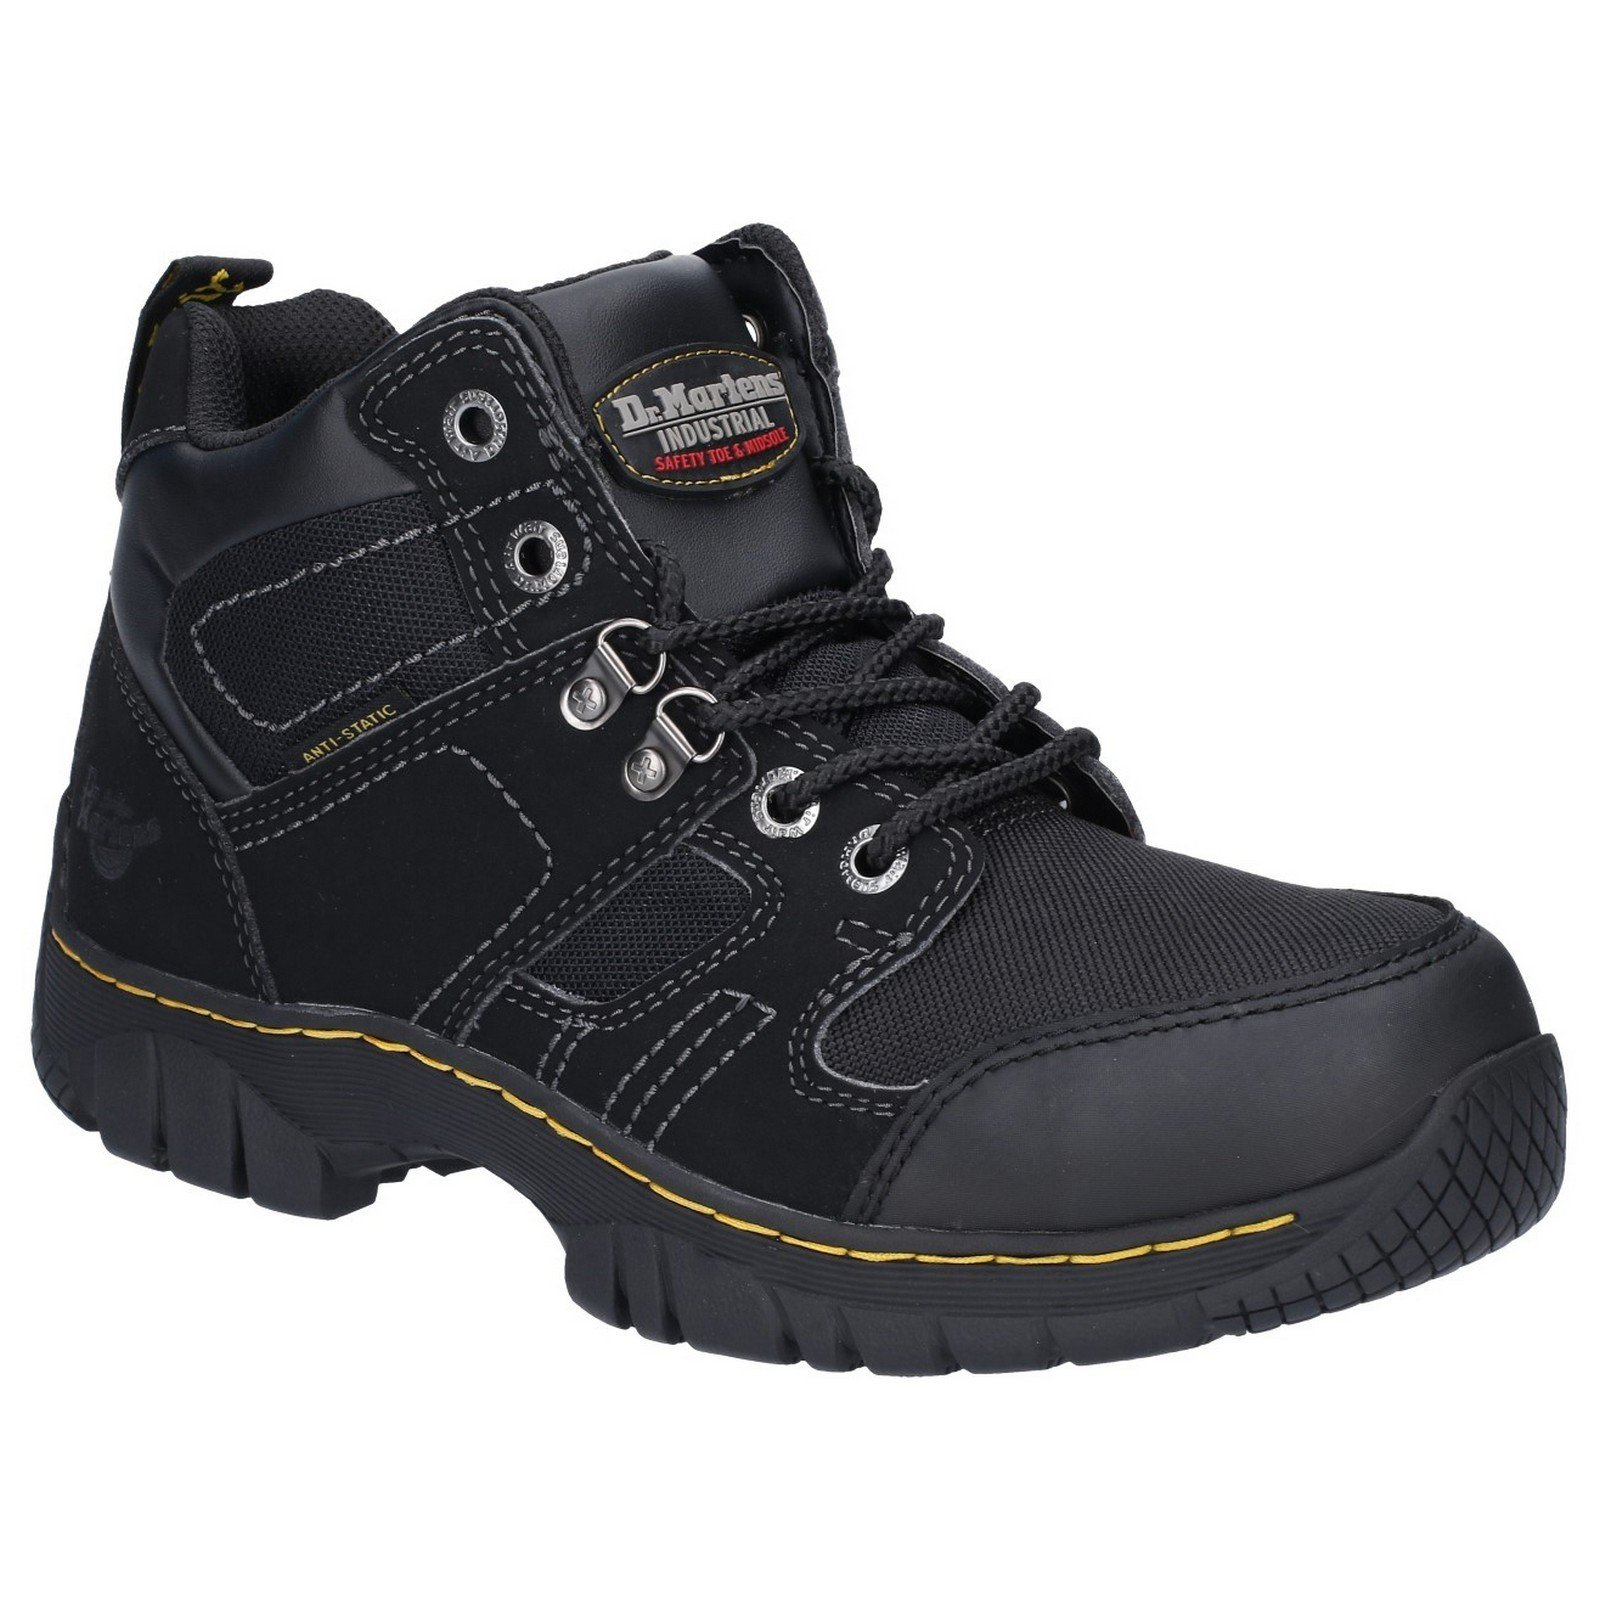 Dr Martens Unisex Benham Safety Boots Black 21647-34773 - Black 6